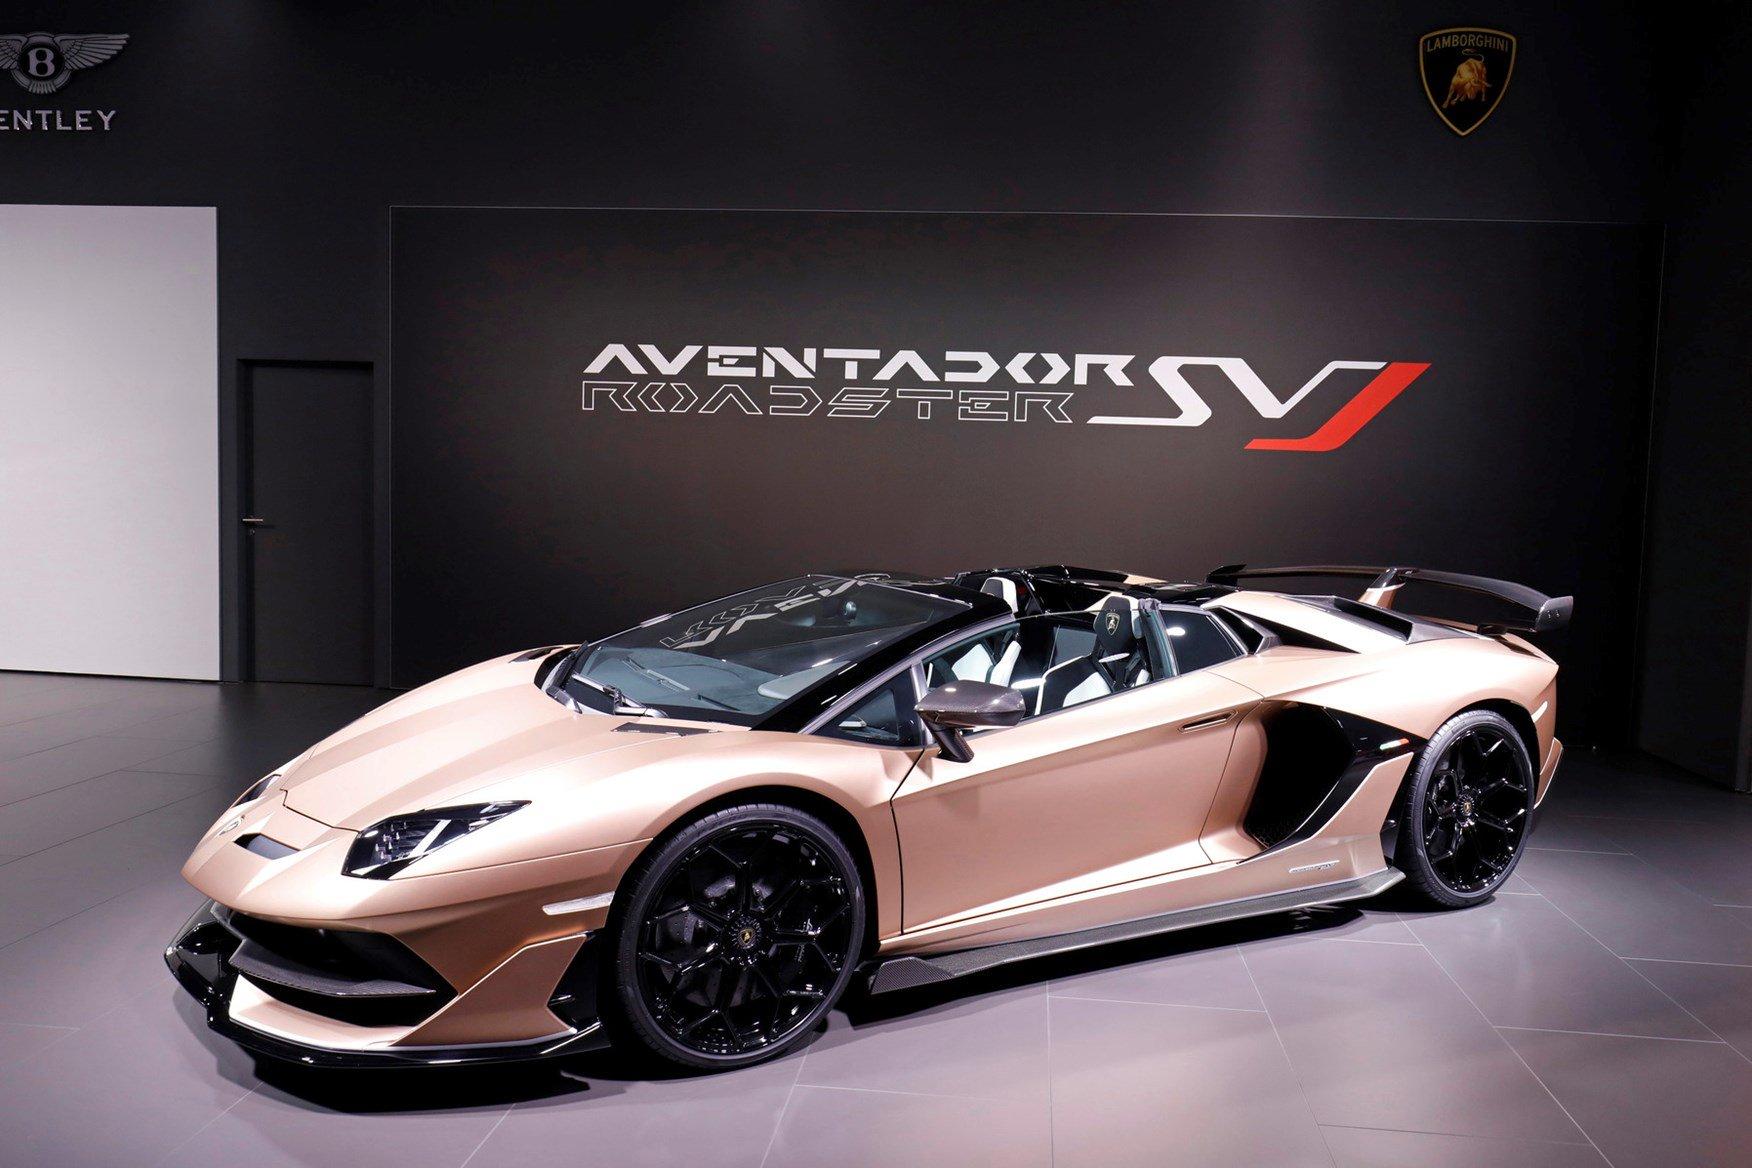 Lamborghini Aventador Svj Roadster Pricing For South Africa